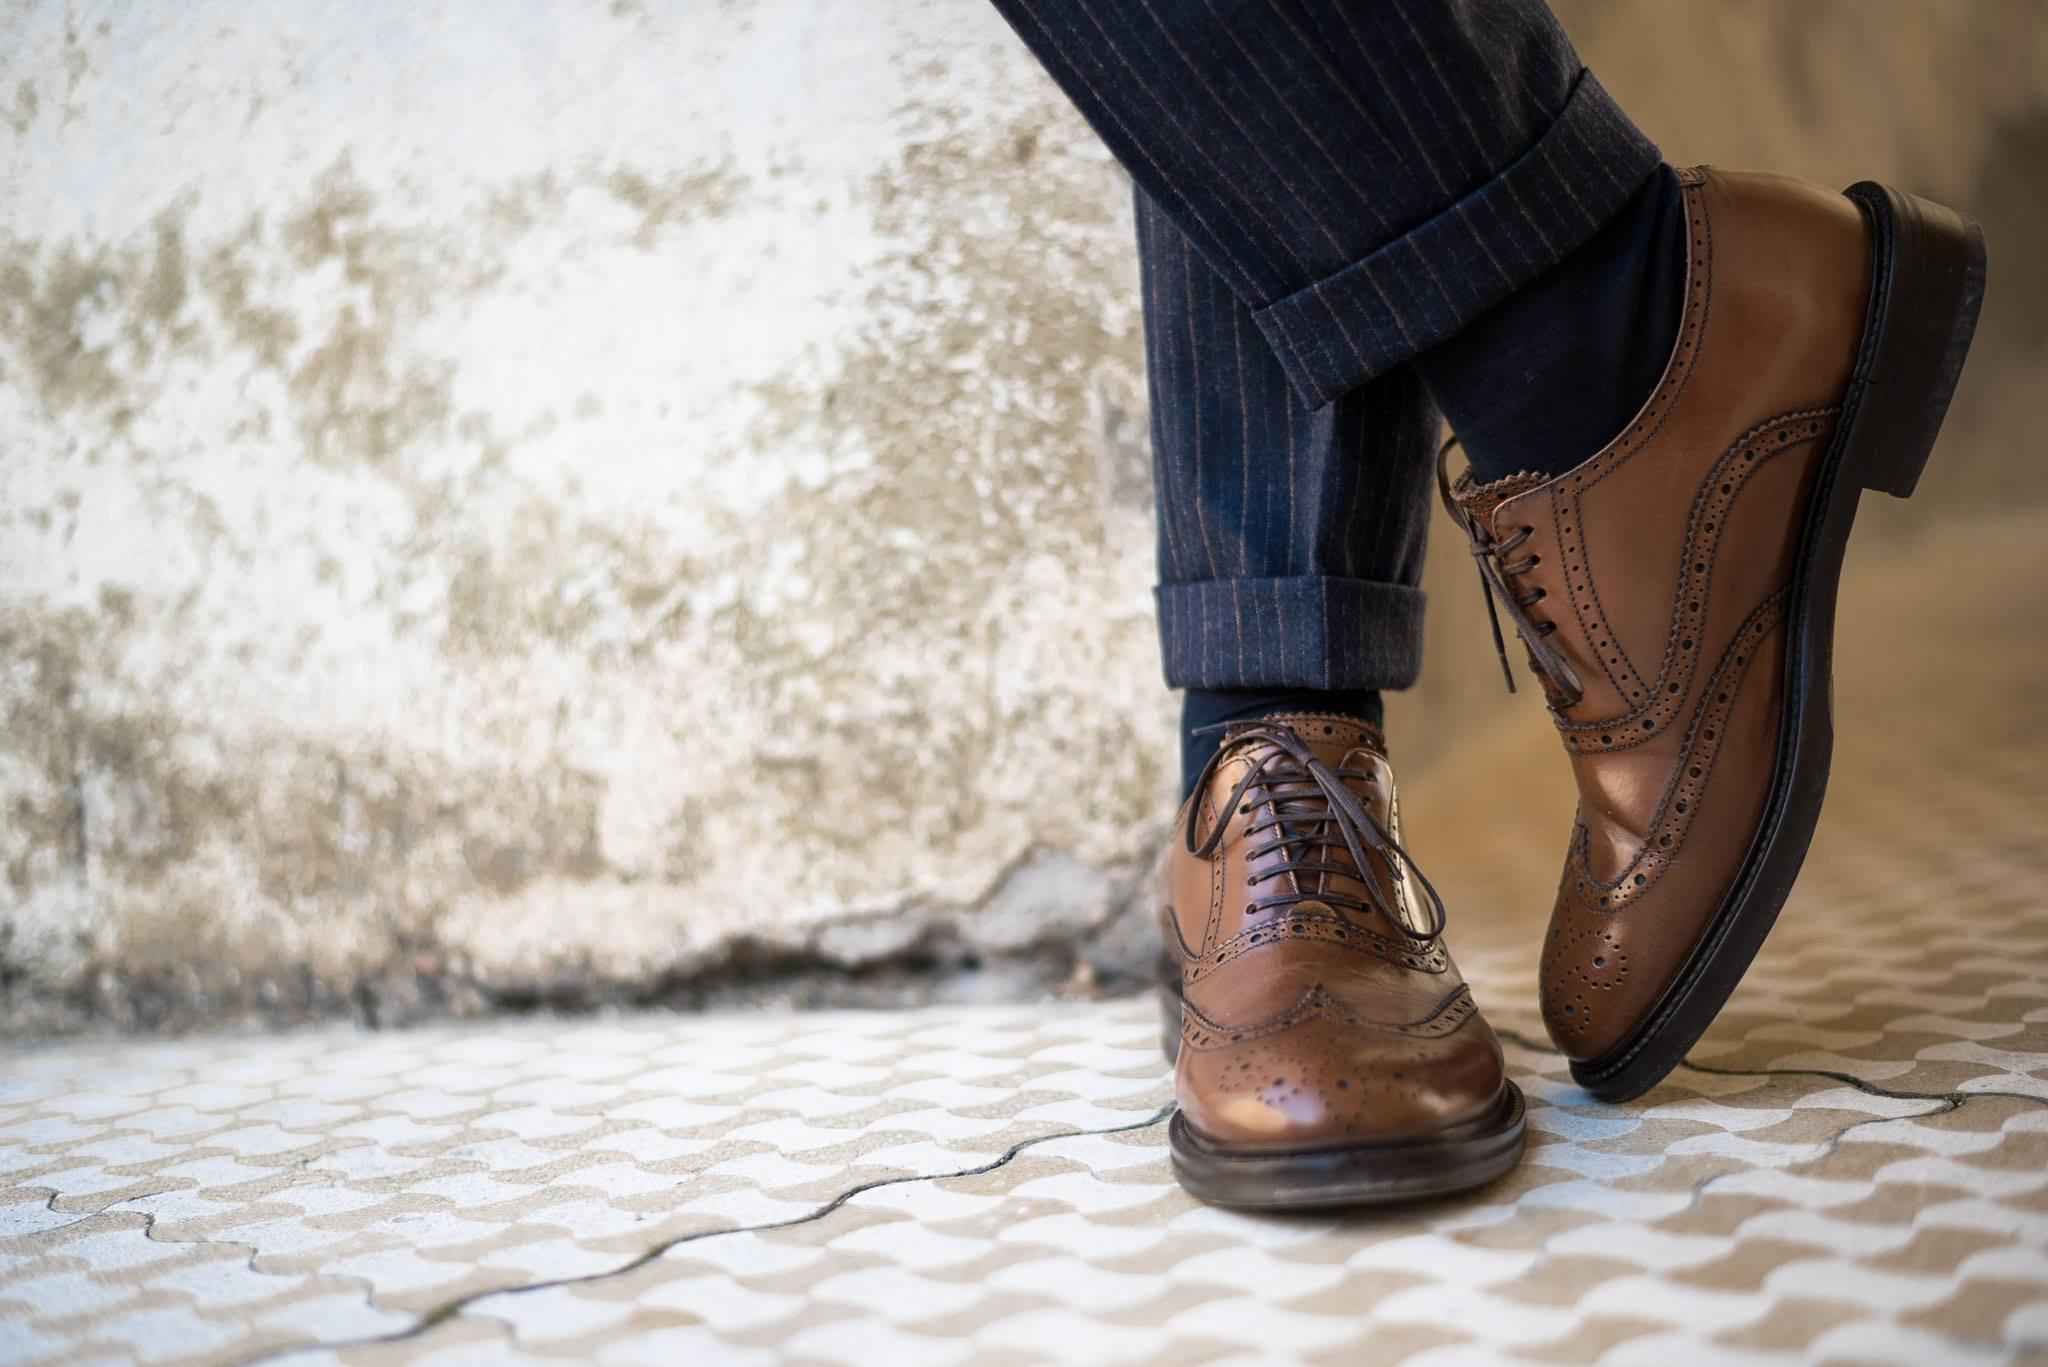 marcotaddei-marco-taddei-simplymrt-simply-mr-t-simply-mrt-fashion-blogger-uomo-fashionblogger-menswear-gentleman-outfit-instagram-scarpe-uomo-shoes-shusala-scarpa-classica